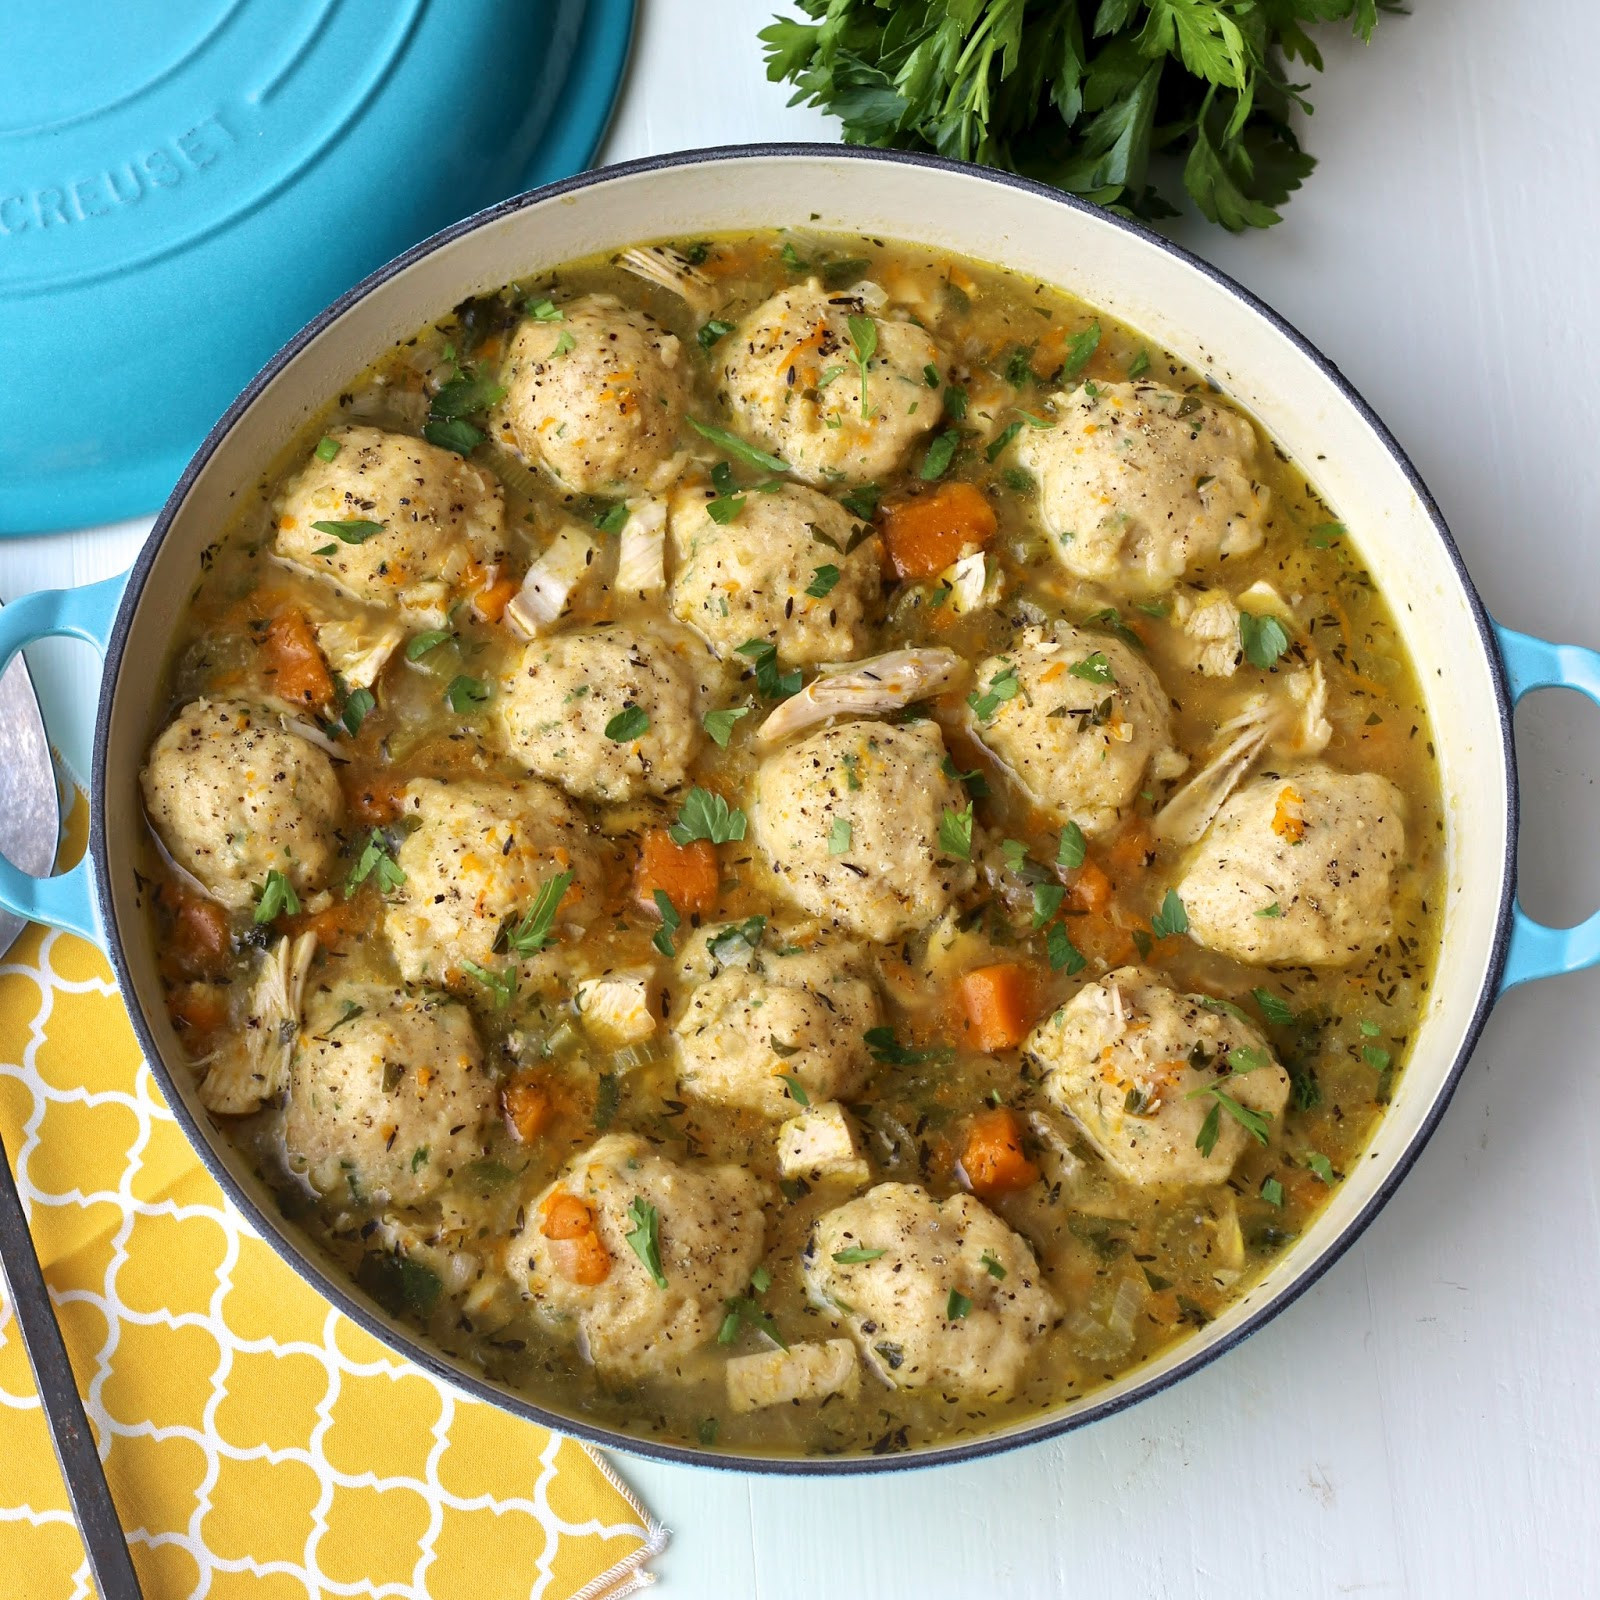 Healthy Chicken Dumplings  Recipe Resuscitation Chicken and Dumplings